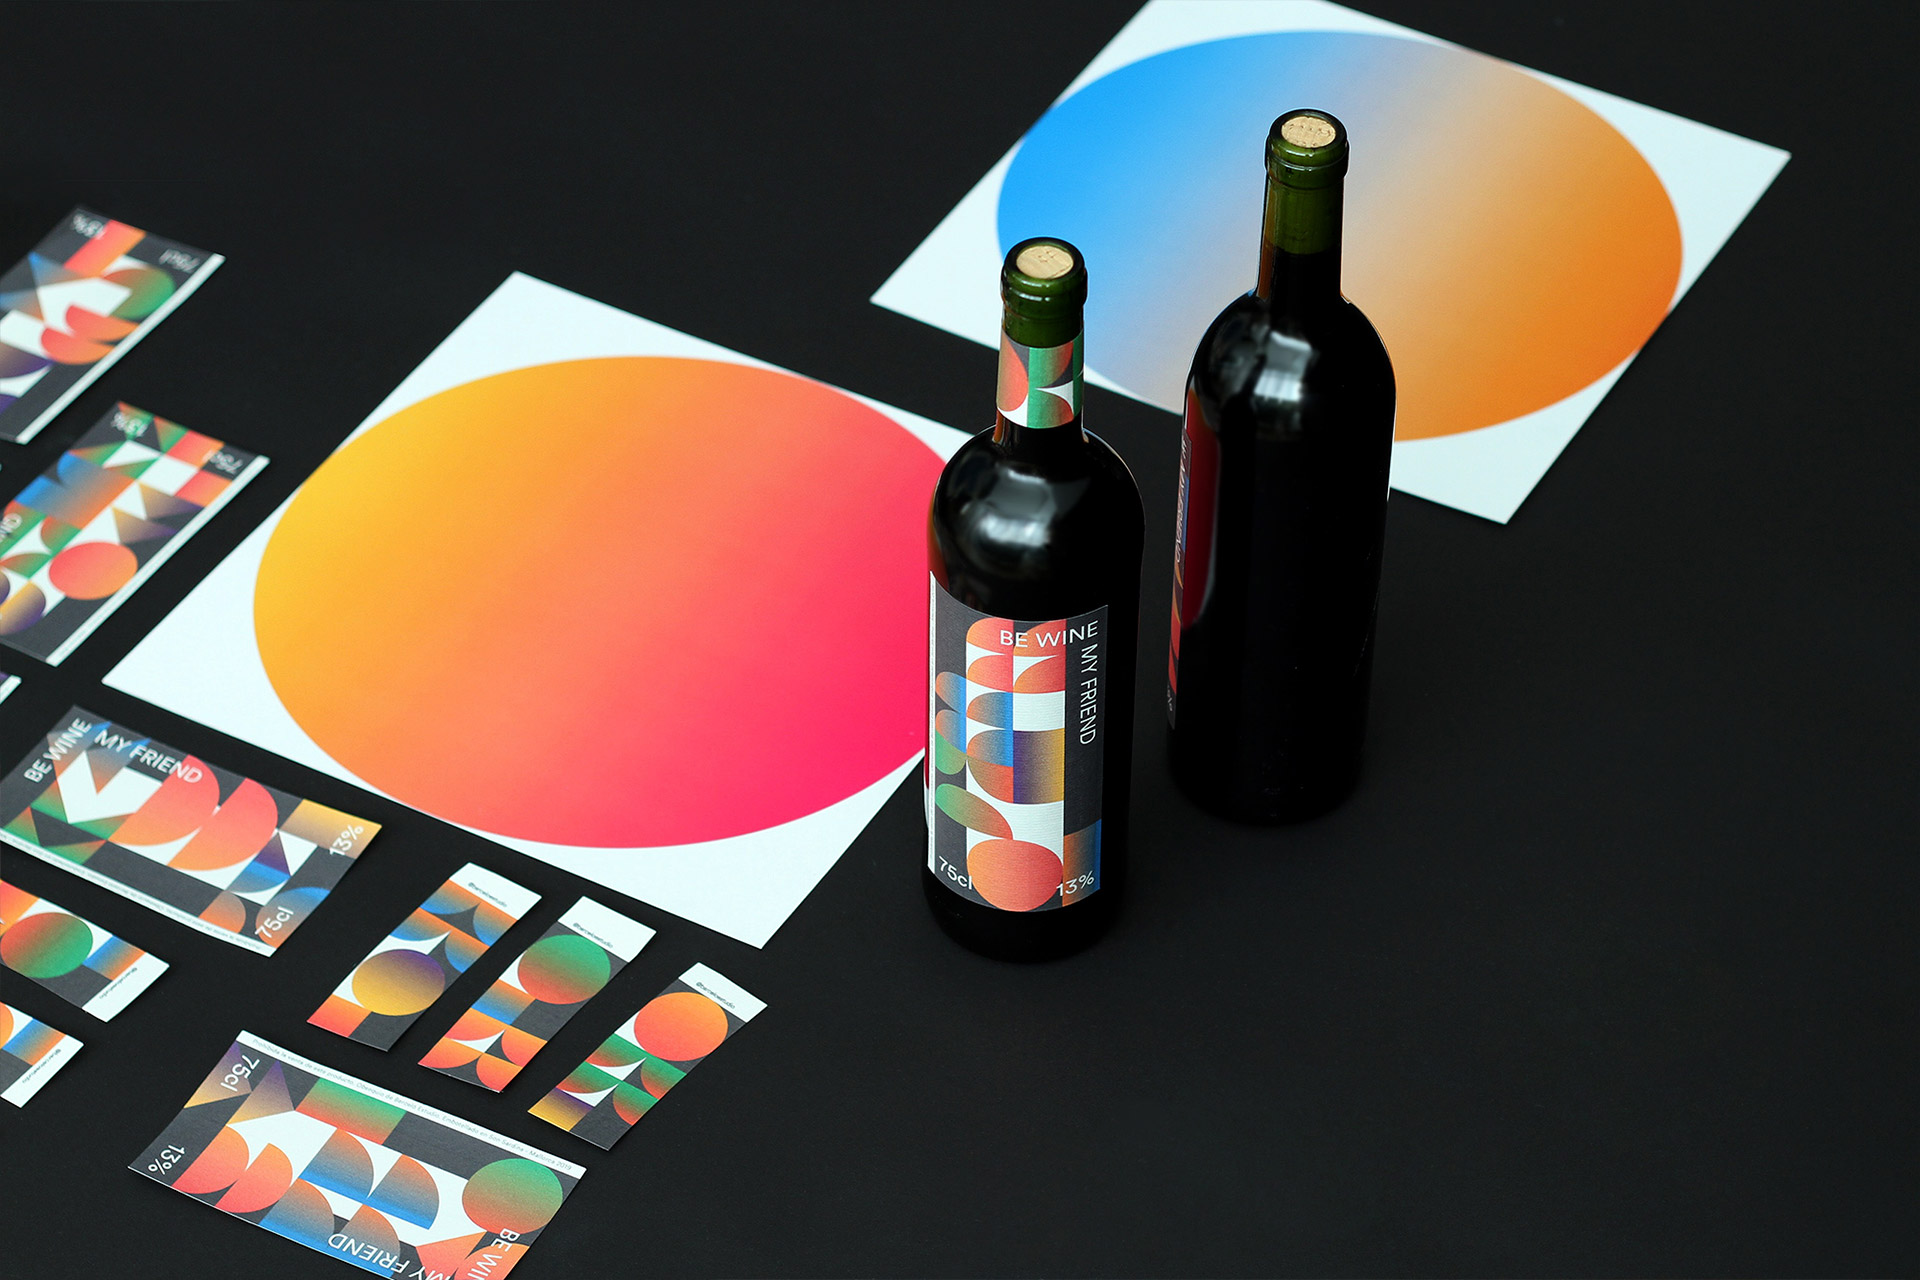 Be winBe Wine My Friend  by Barceló estudio - Creative Work - $i